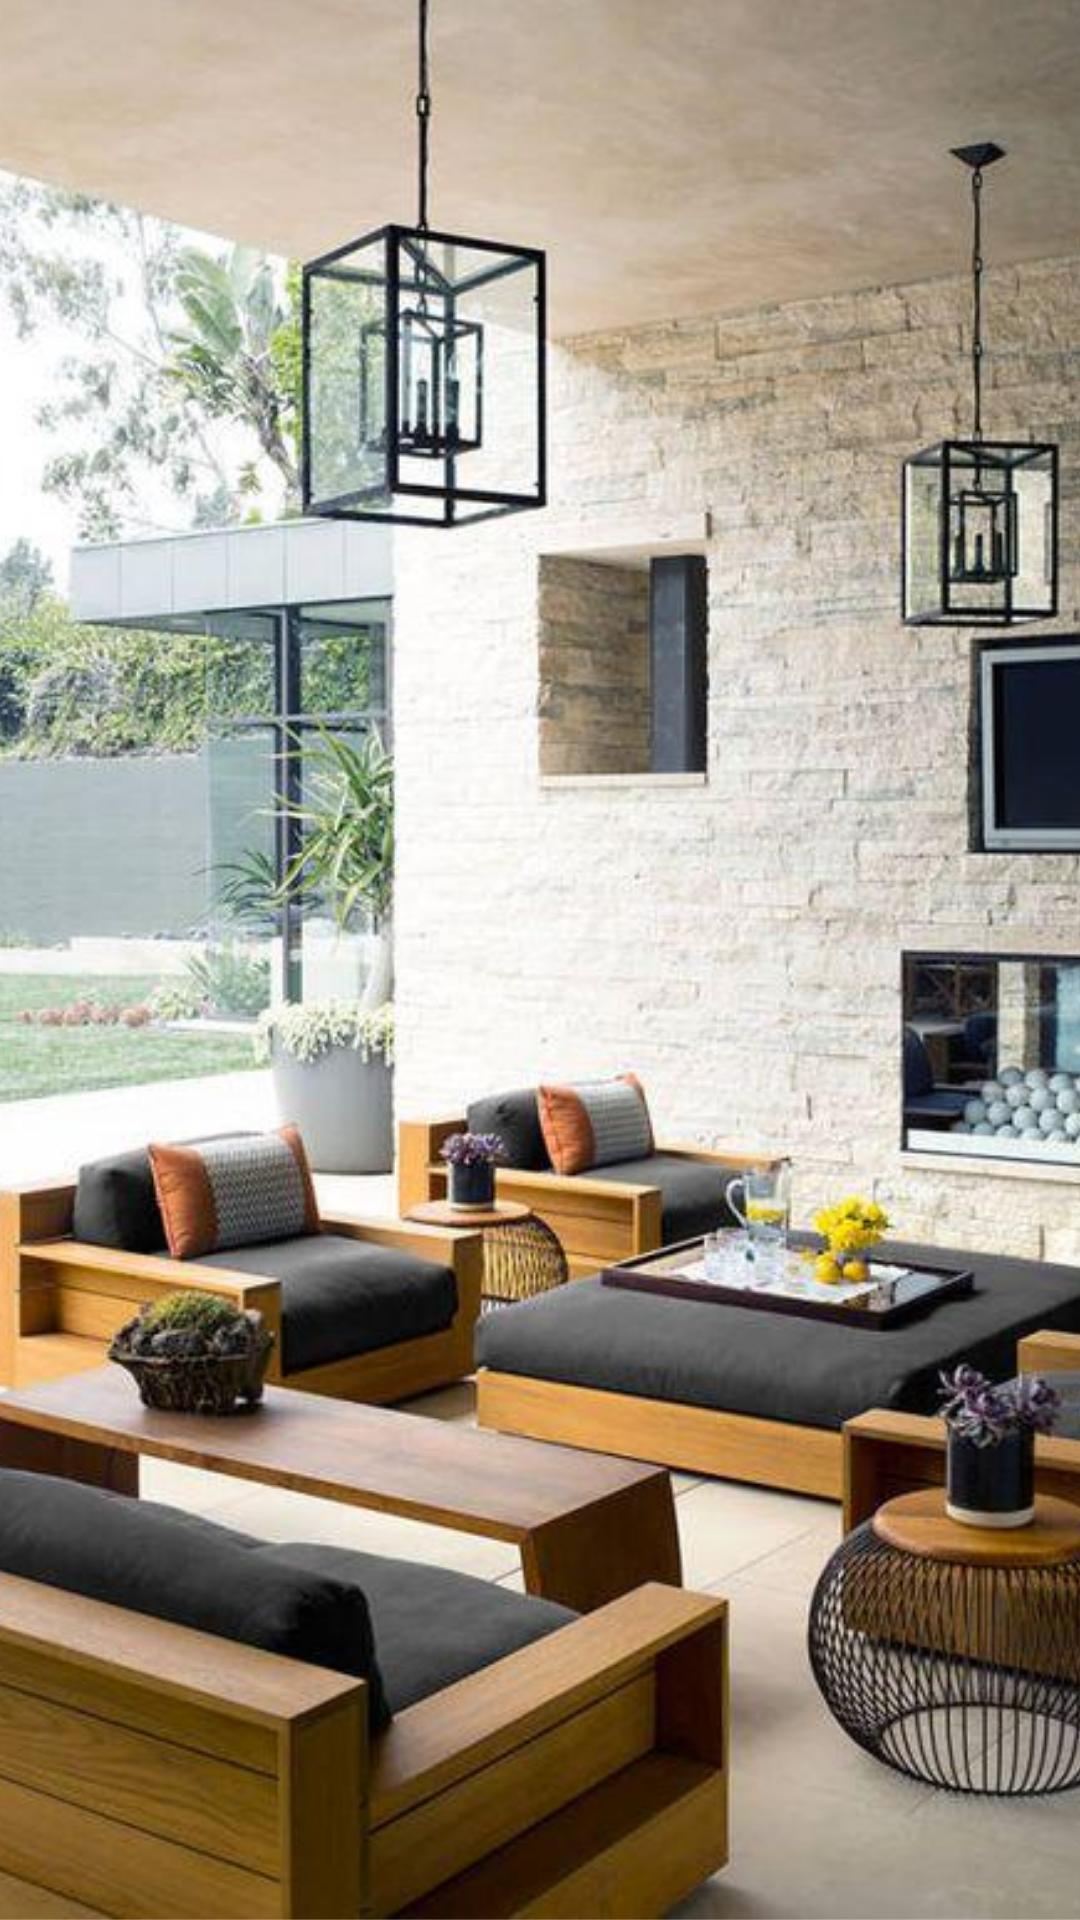 Wood Sofa Set Furniture Design Wood Settee Living Room Decor Sofa Ideas Home Decor Inspo In 2020 Patio Furniture Layout Patio Interior Patio Furnishings #wooden #sofas #for #living #room